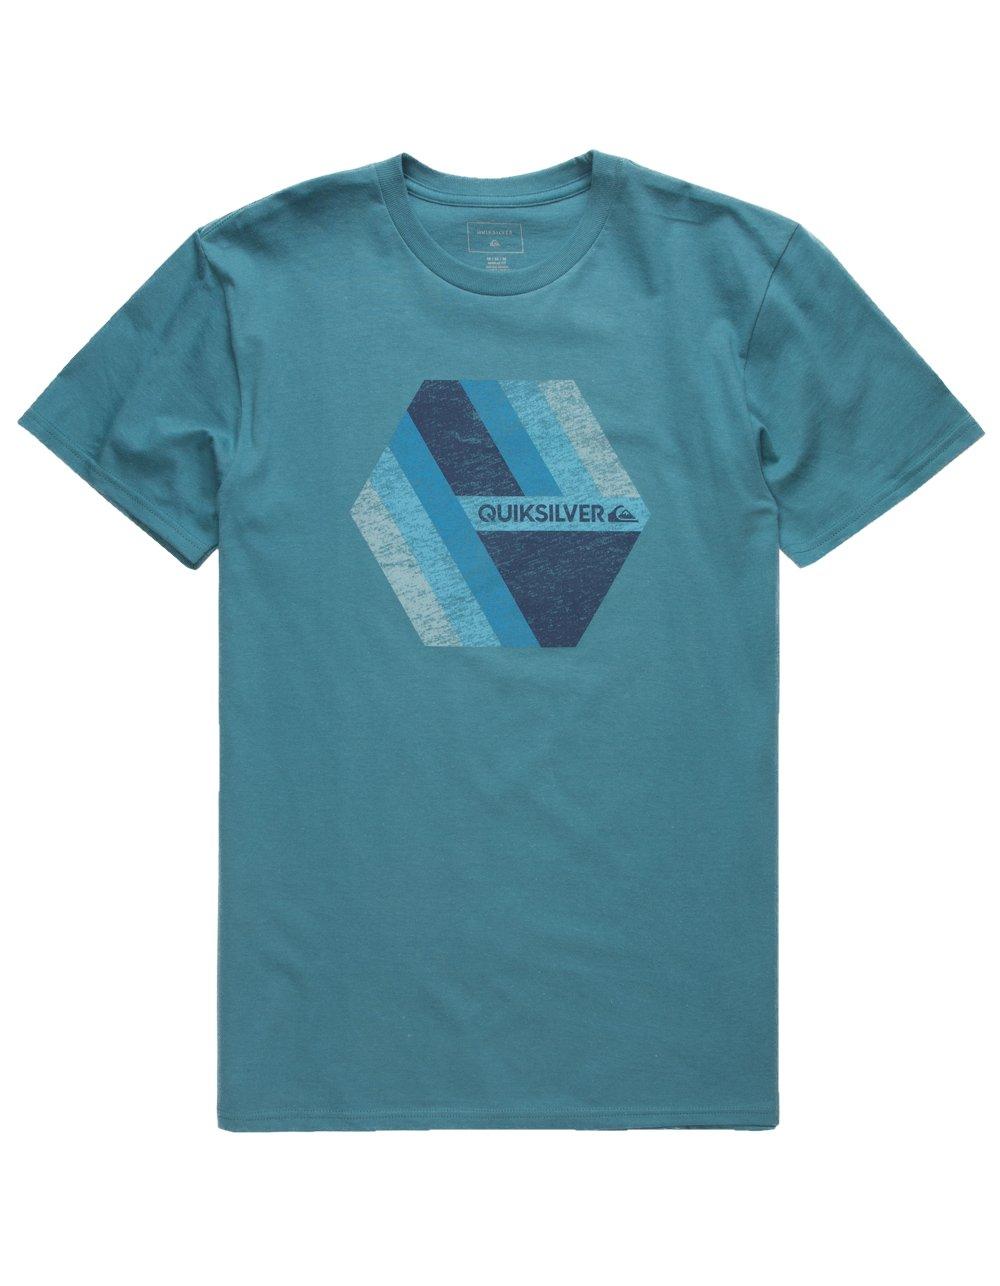 Quiksilver Men's Retro Right Tee Shirt, Tapestry, XL